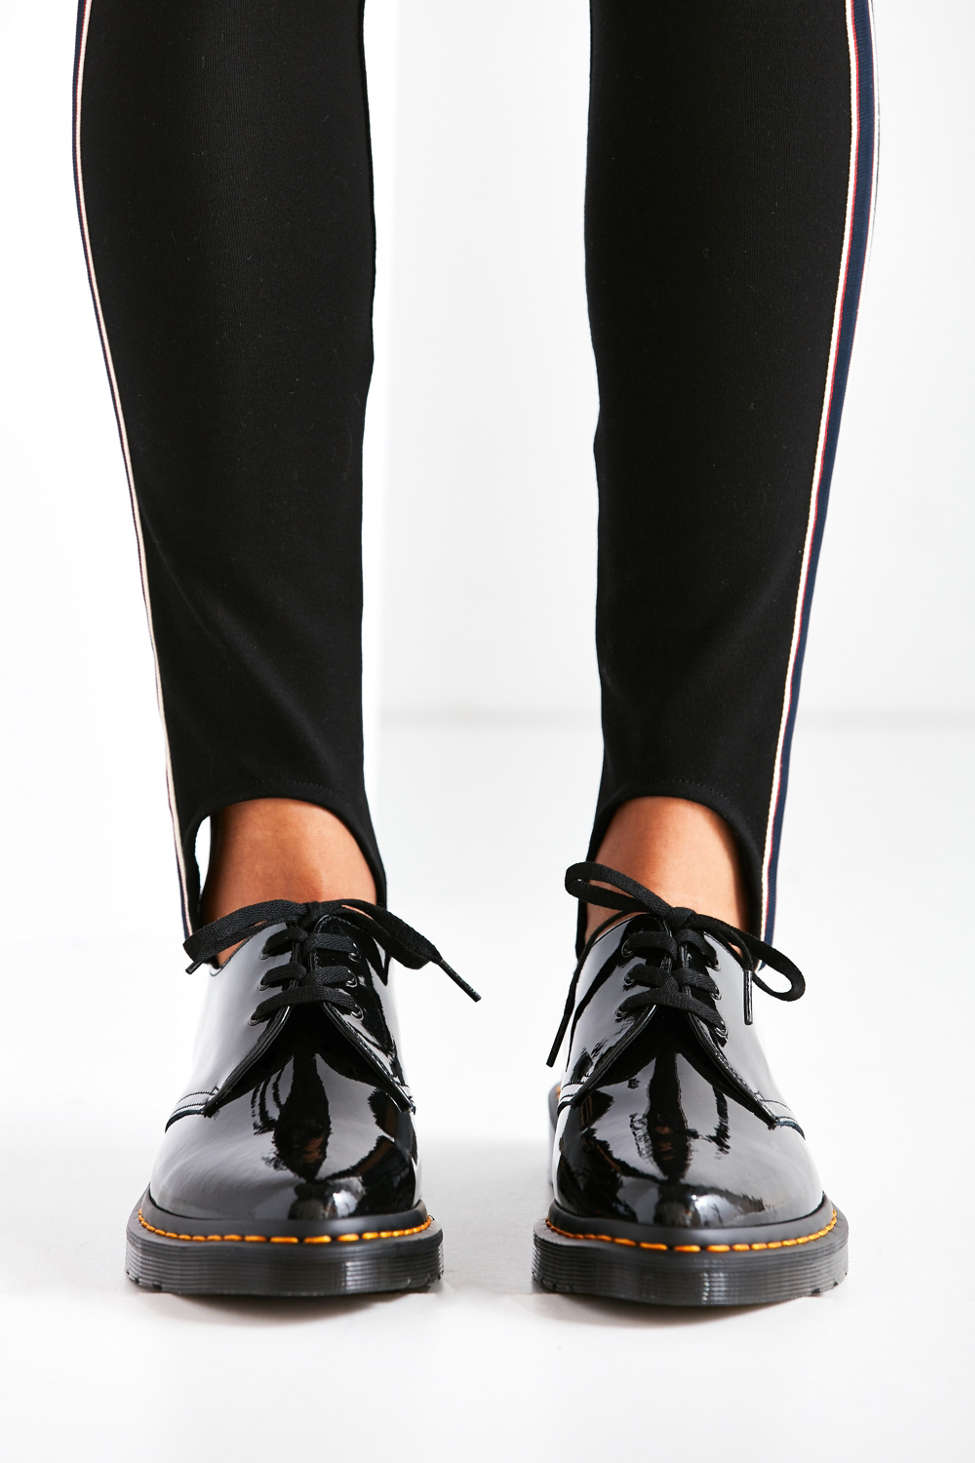 Dr Martens Dupree Patent Leather 3 Eye Shoe Urban